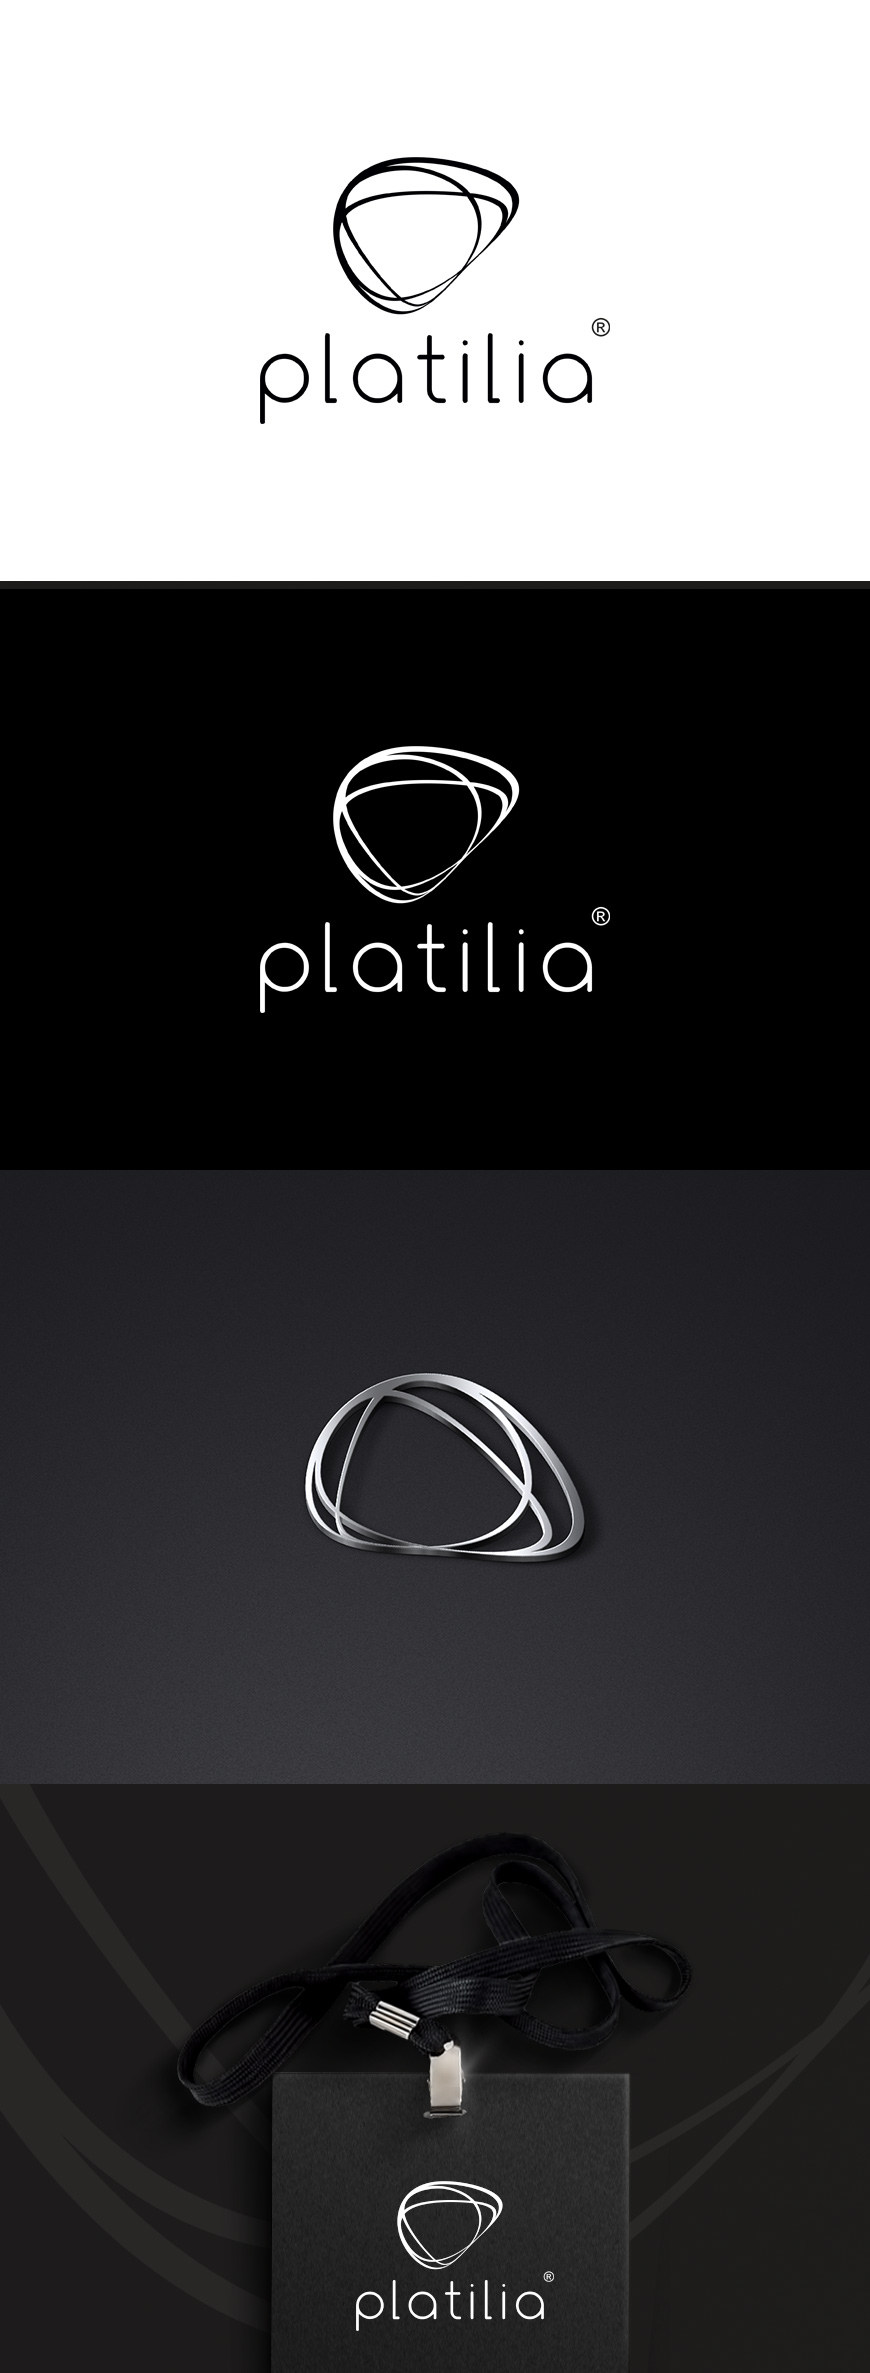 platilia_logo